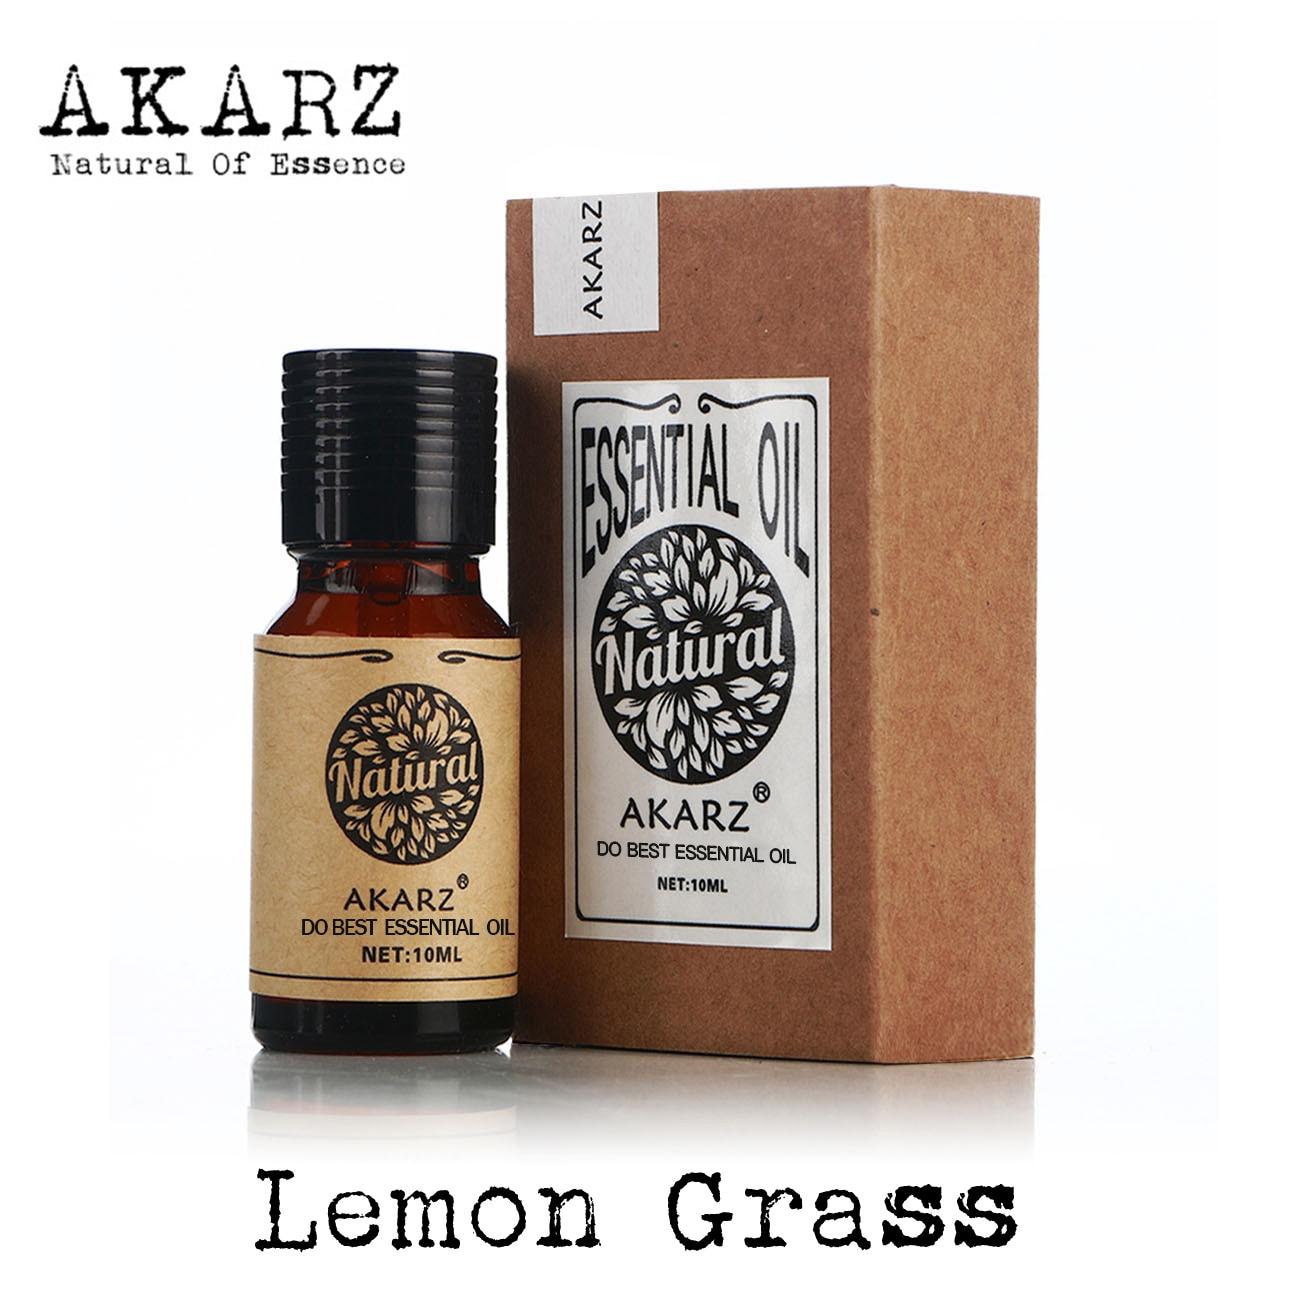 цена на AKARZ Famous brand natural aromatherapy lemon grass essential oil Prevent beriberi Mosquito repellent Relax lemon grass oil